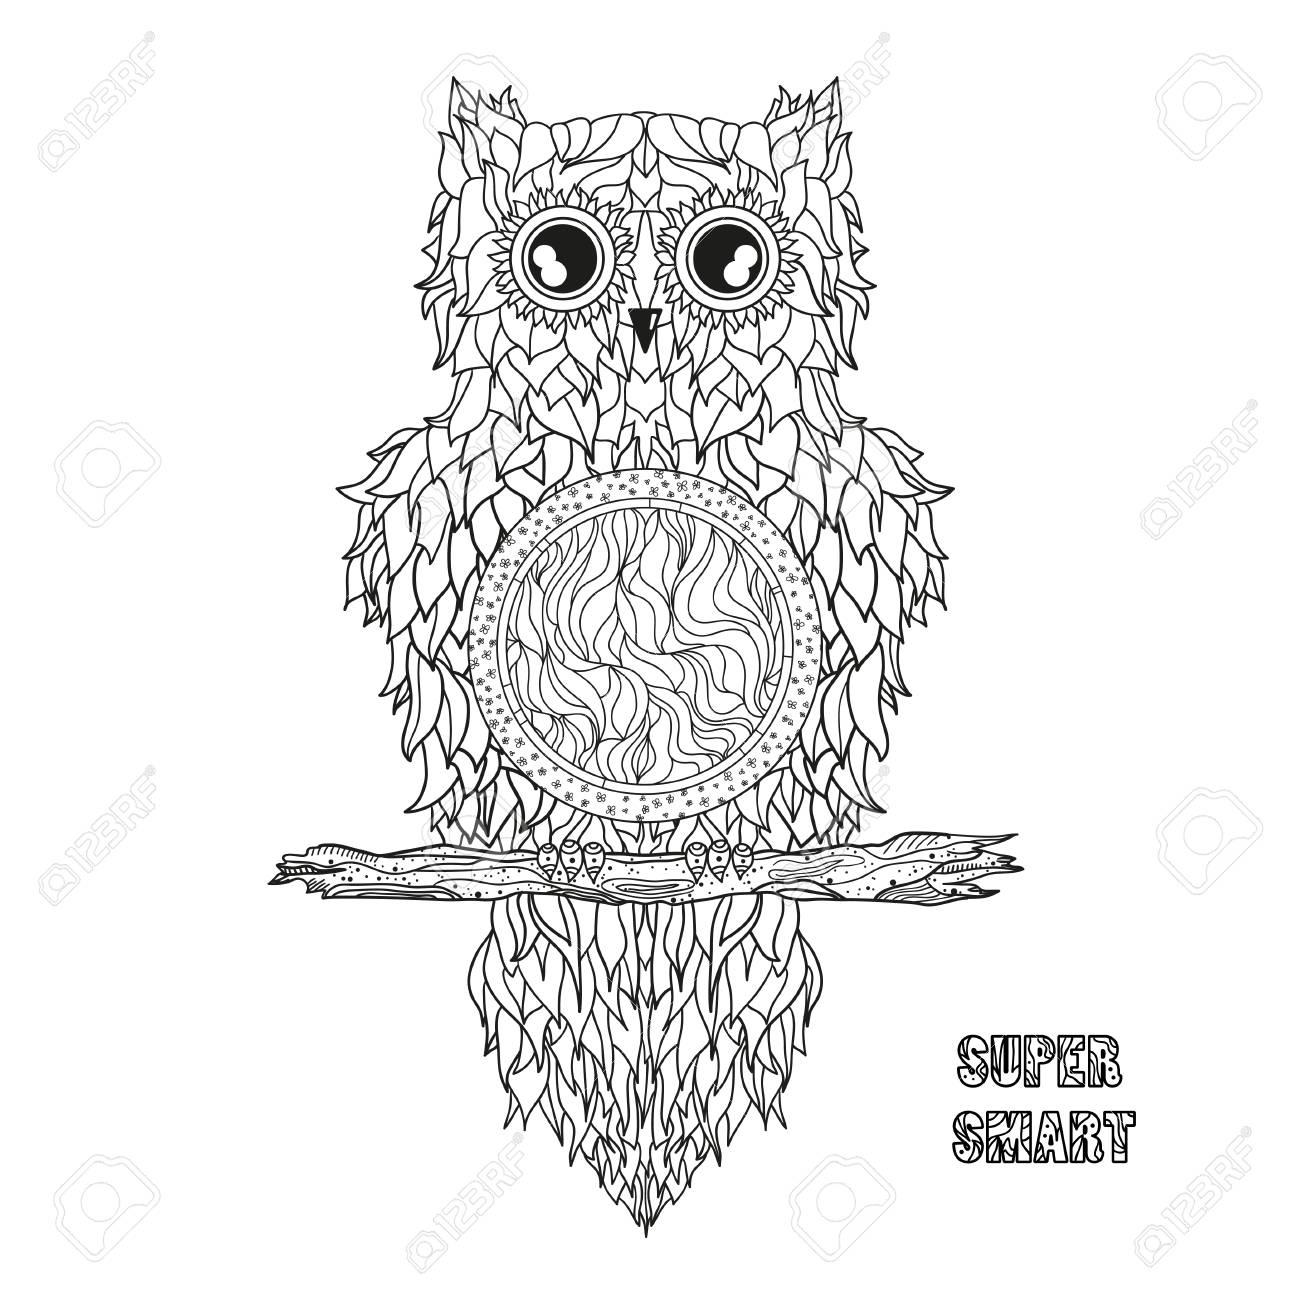 Búho. Mandala. Pájaro Bonito. Buho Nocturno Dibujado Mano Detallada ...